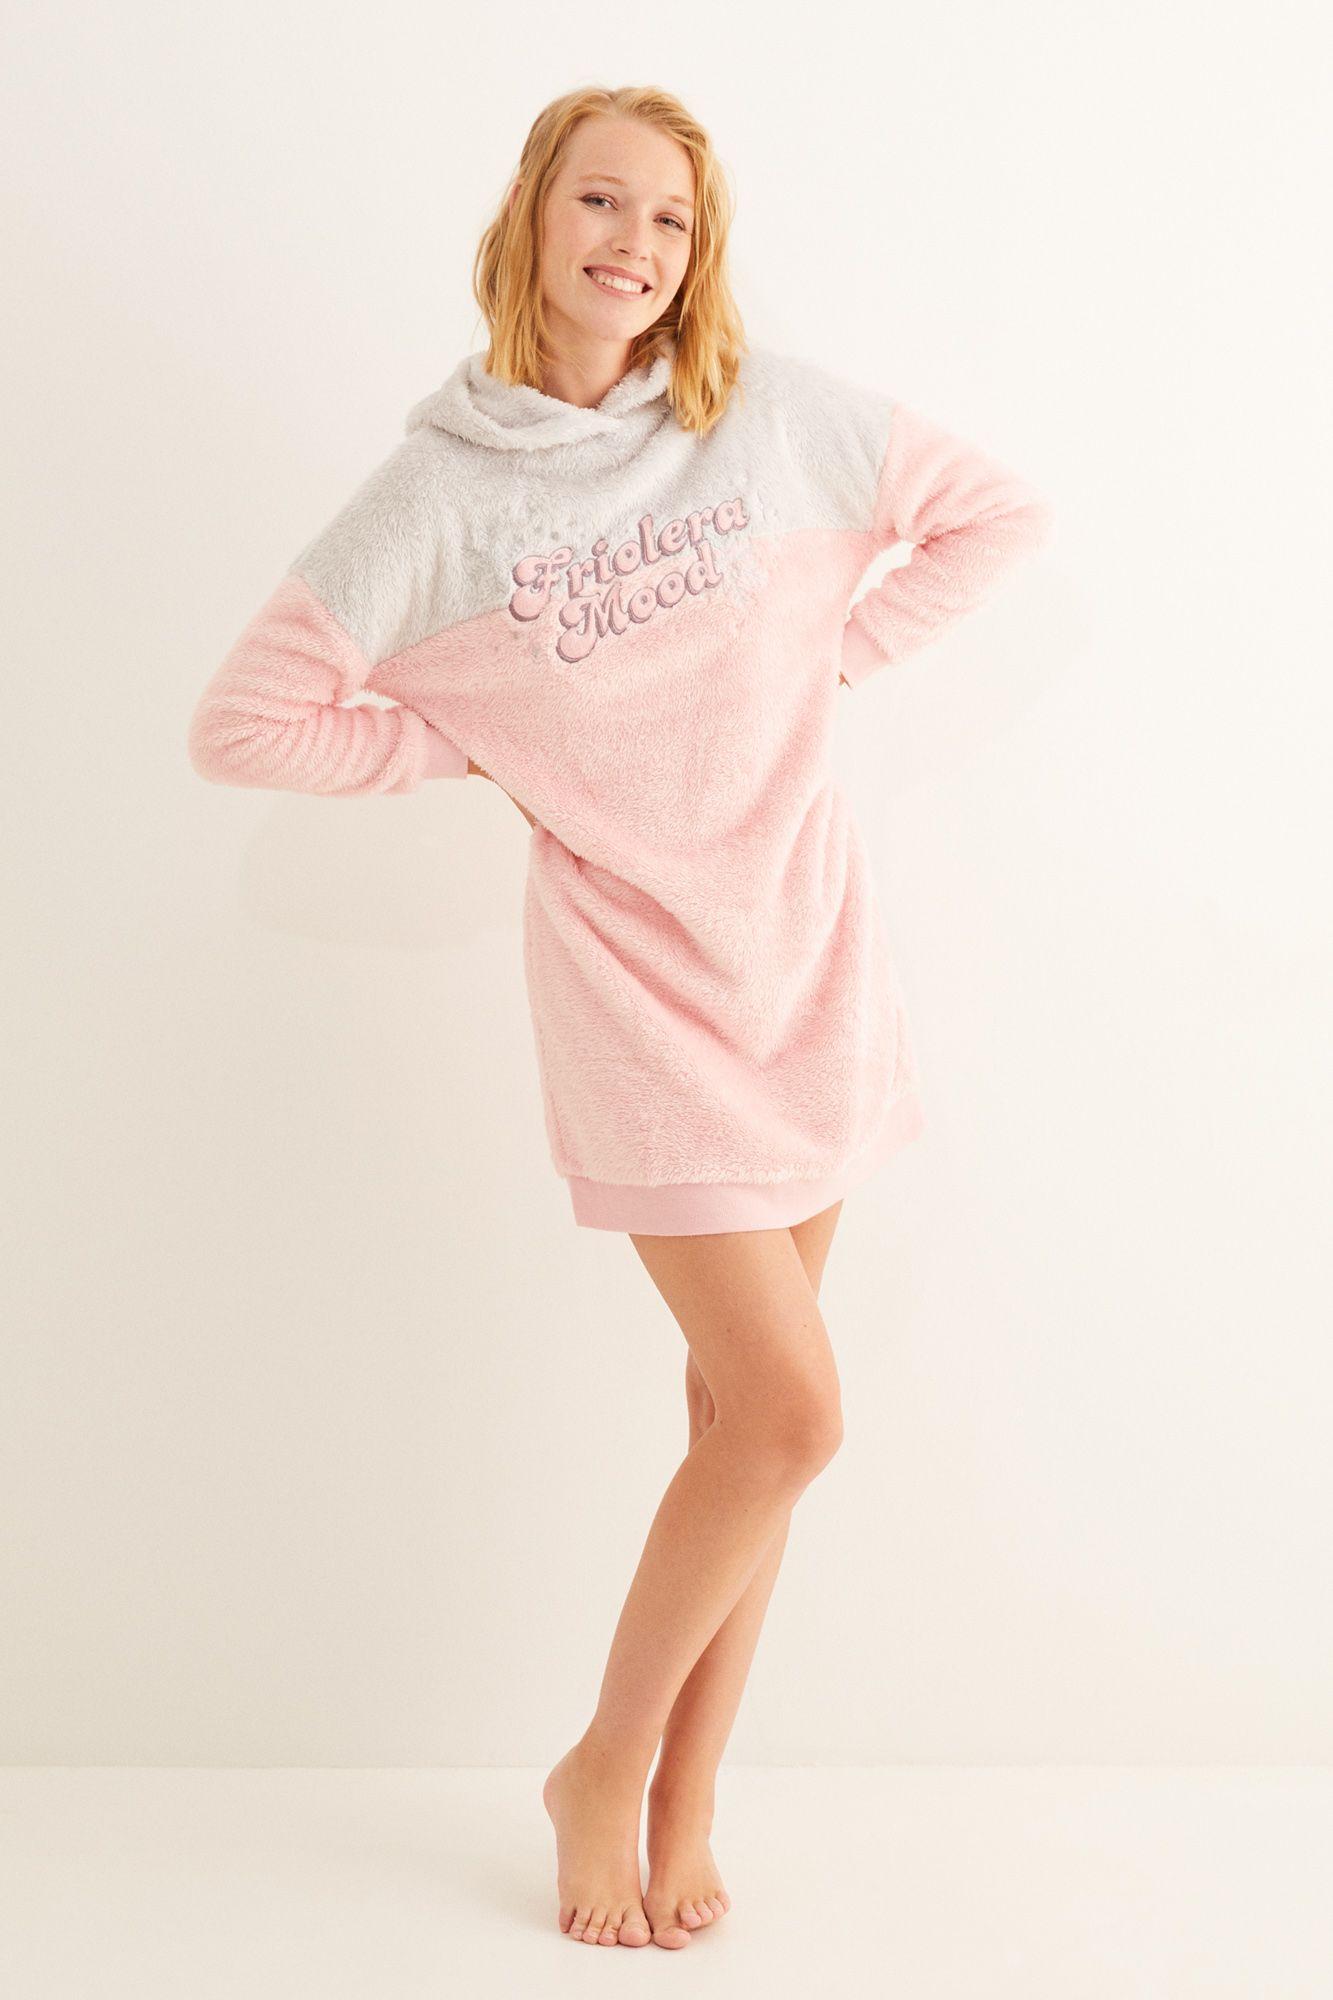 Pijama Largo Gris Algodón La Vecina Rubia Pijamas Largos Women Secret Camisones Paño Rosa Y Gris